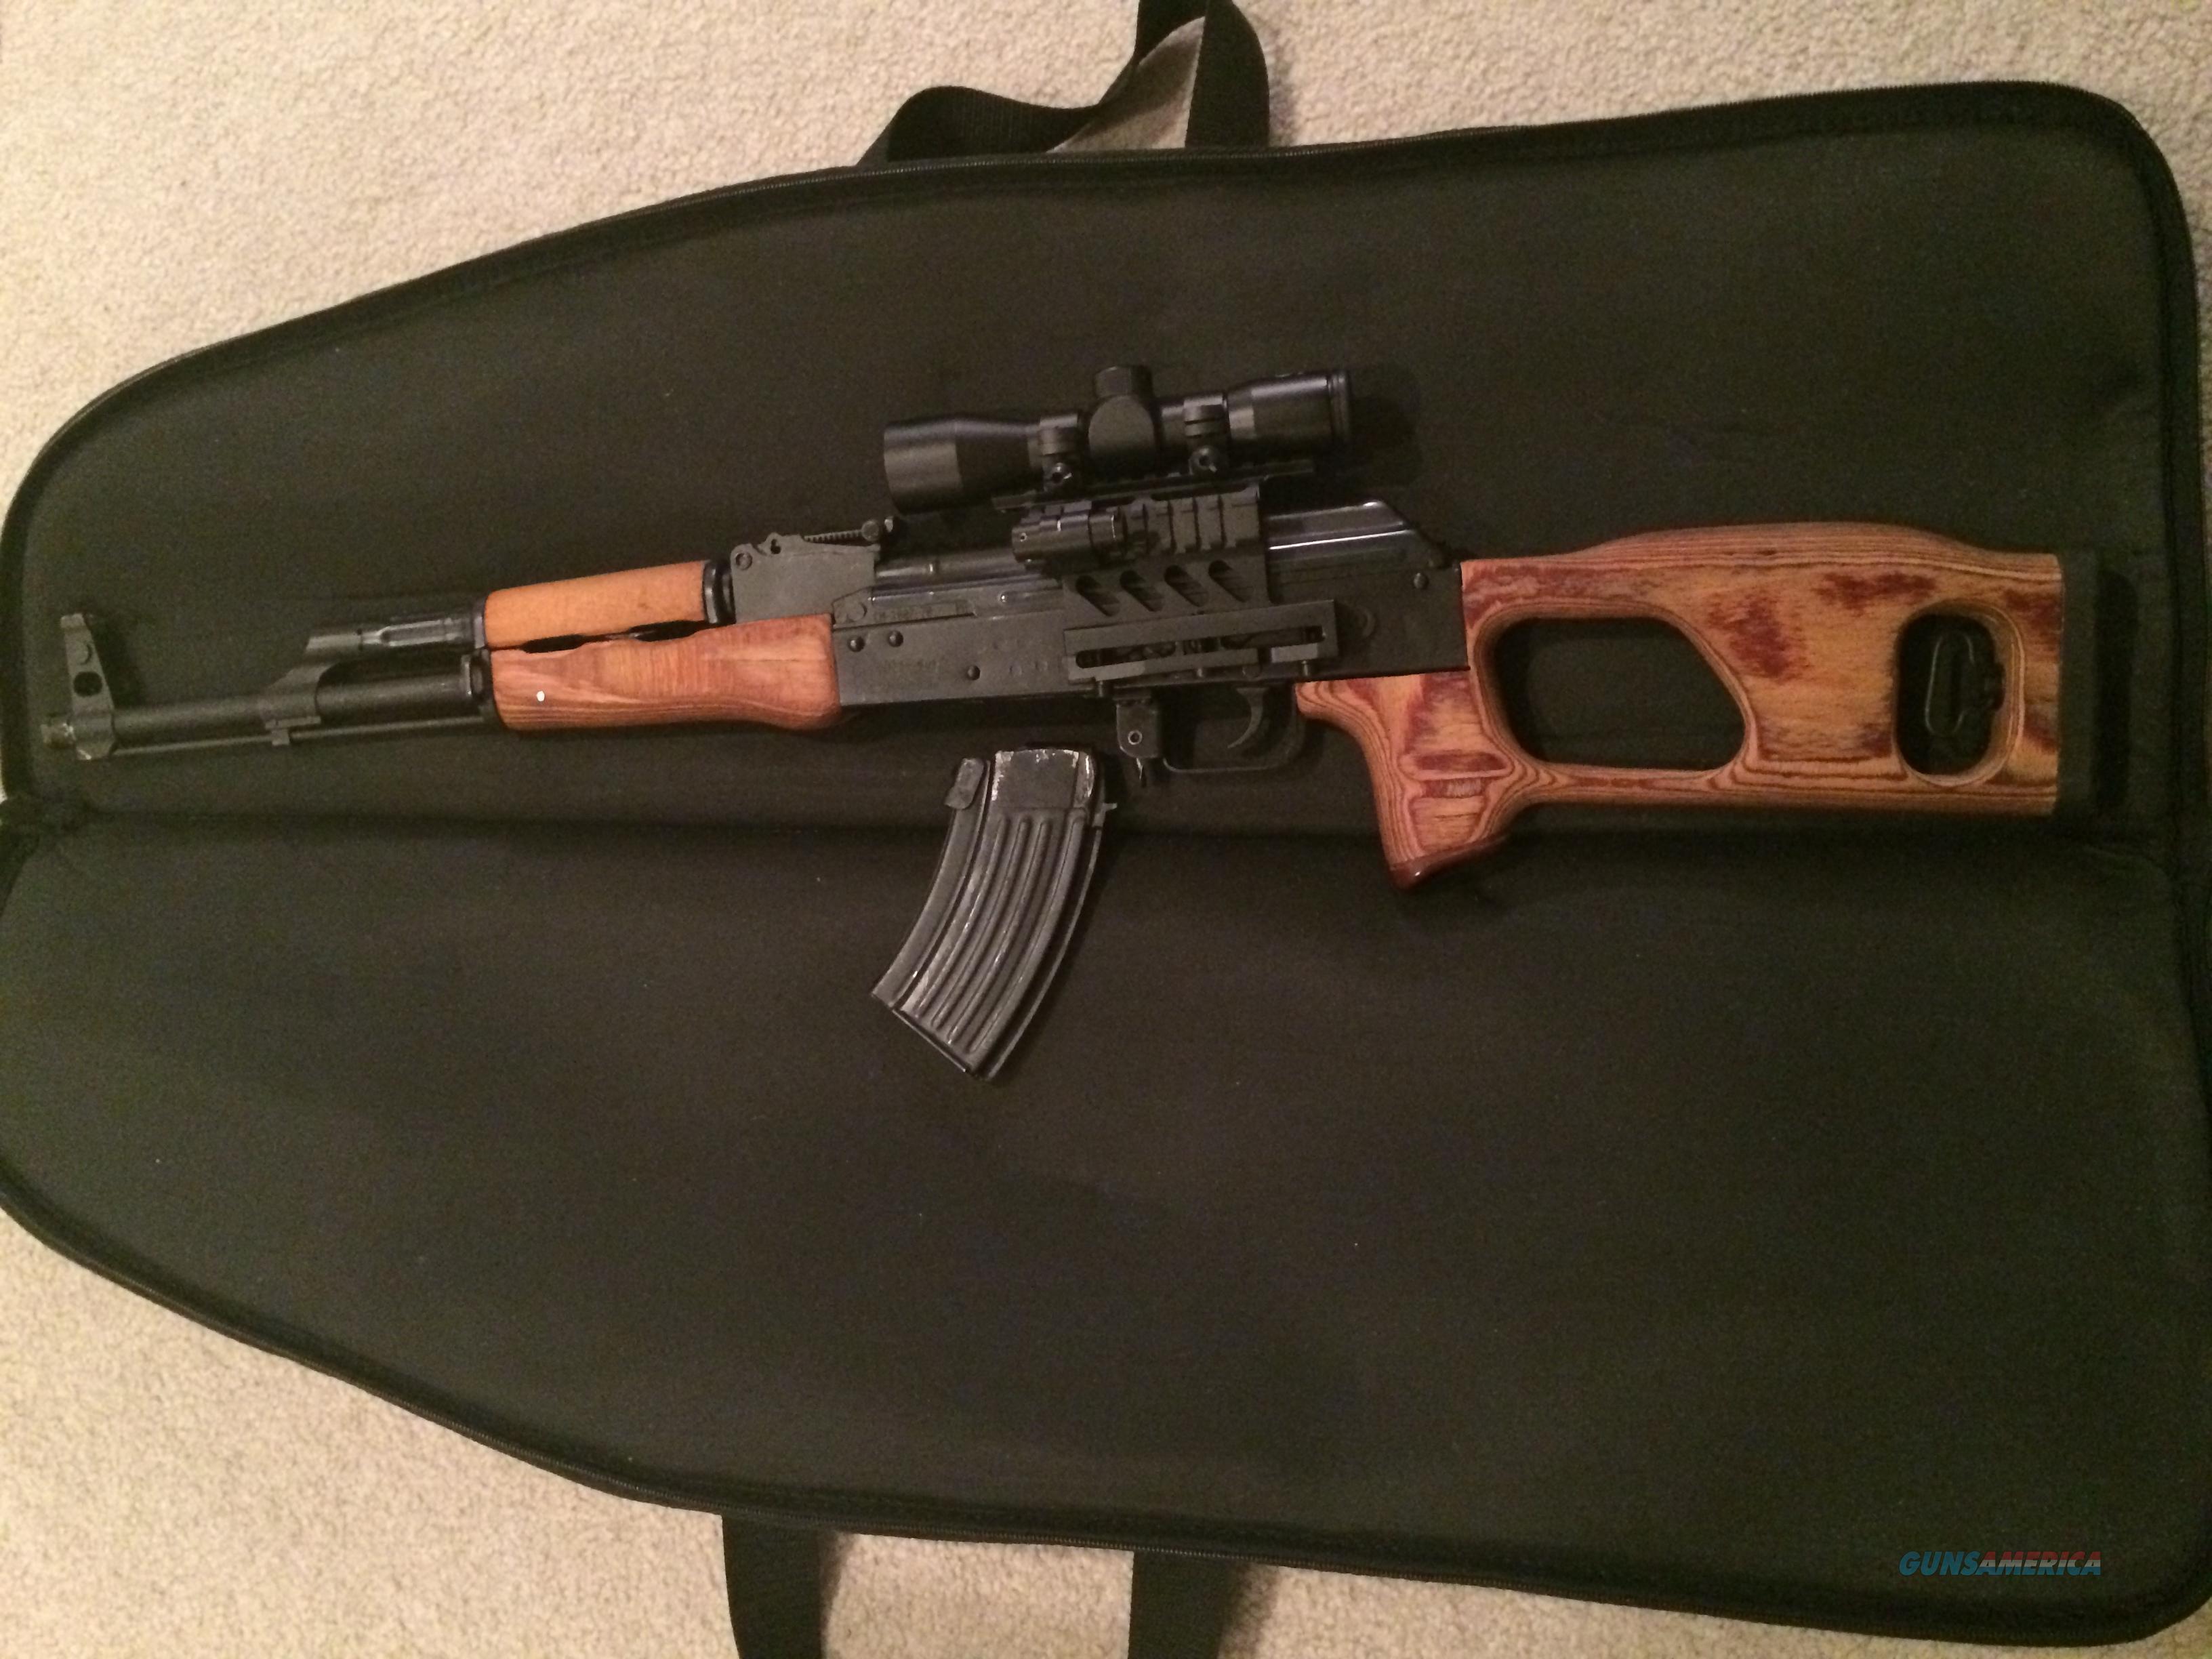 AK-47 - / Tactical Scope & Laser Red Dot - Romanian